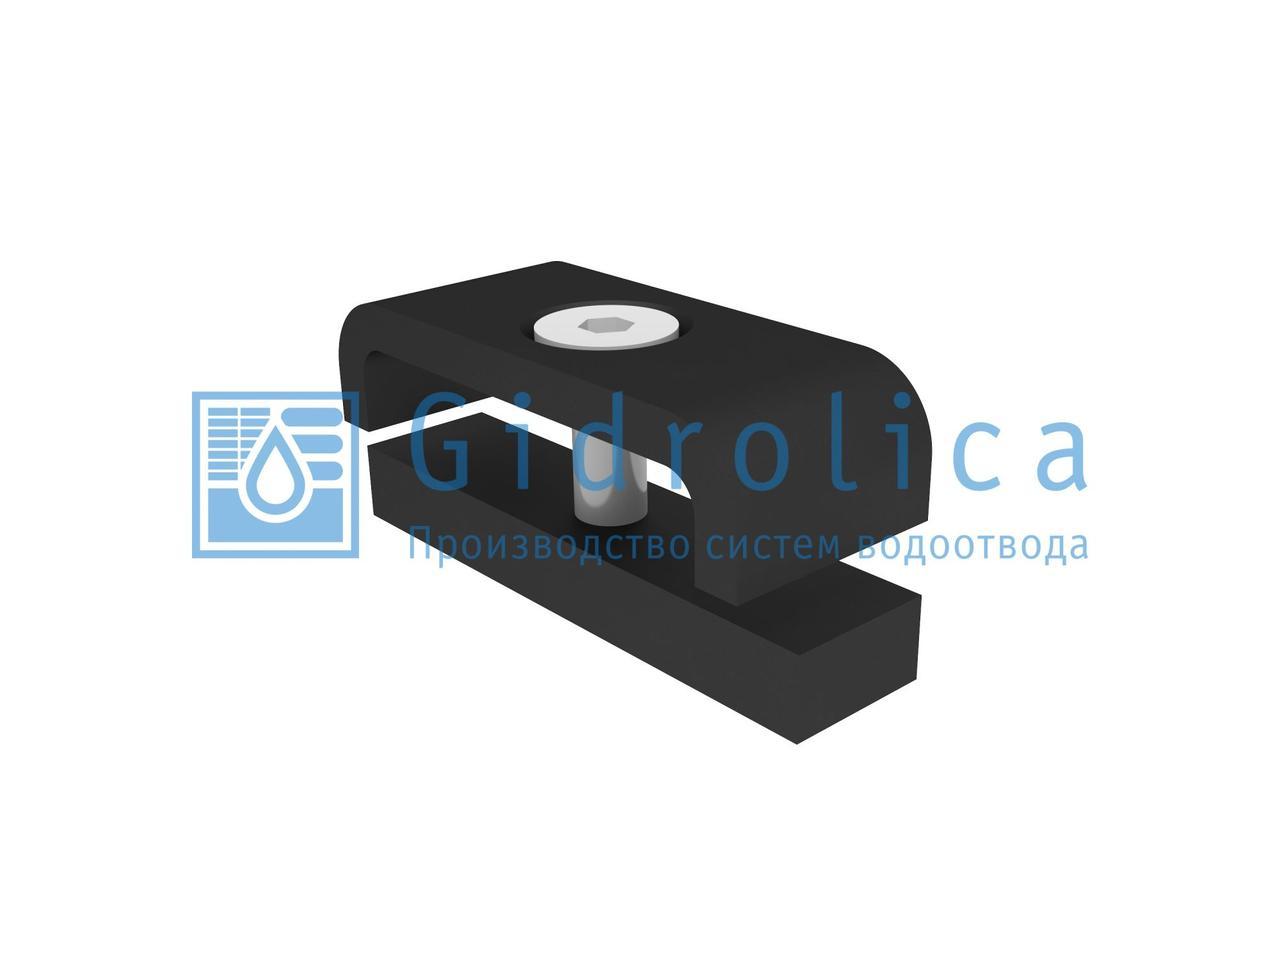 Крепеж Gidrolica для чугунных решеток DN100